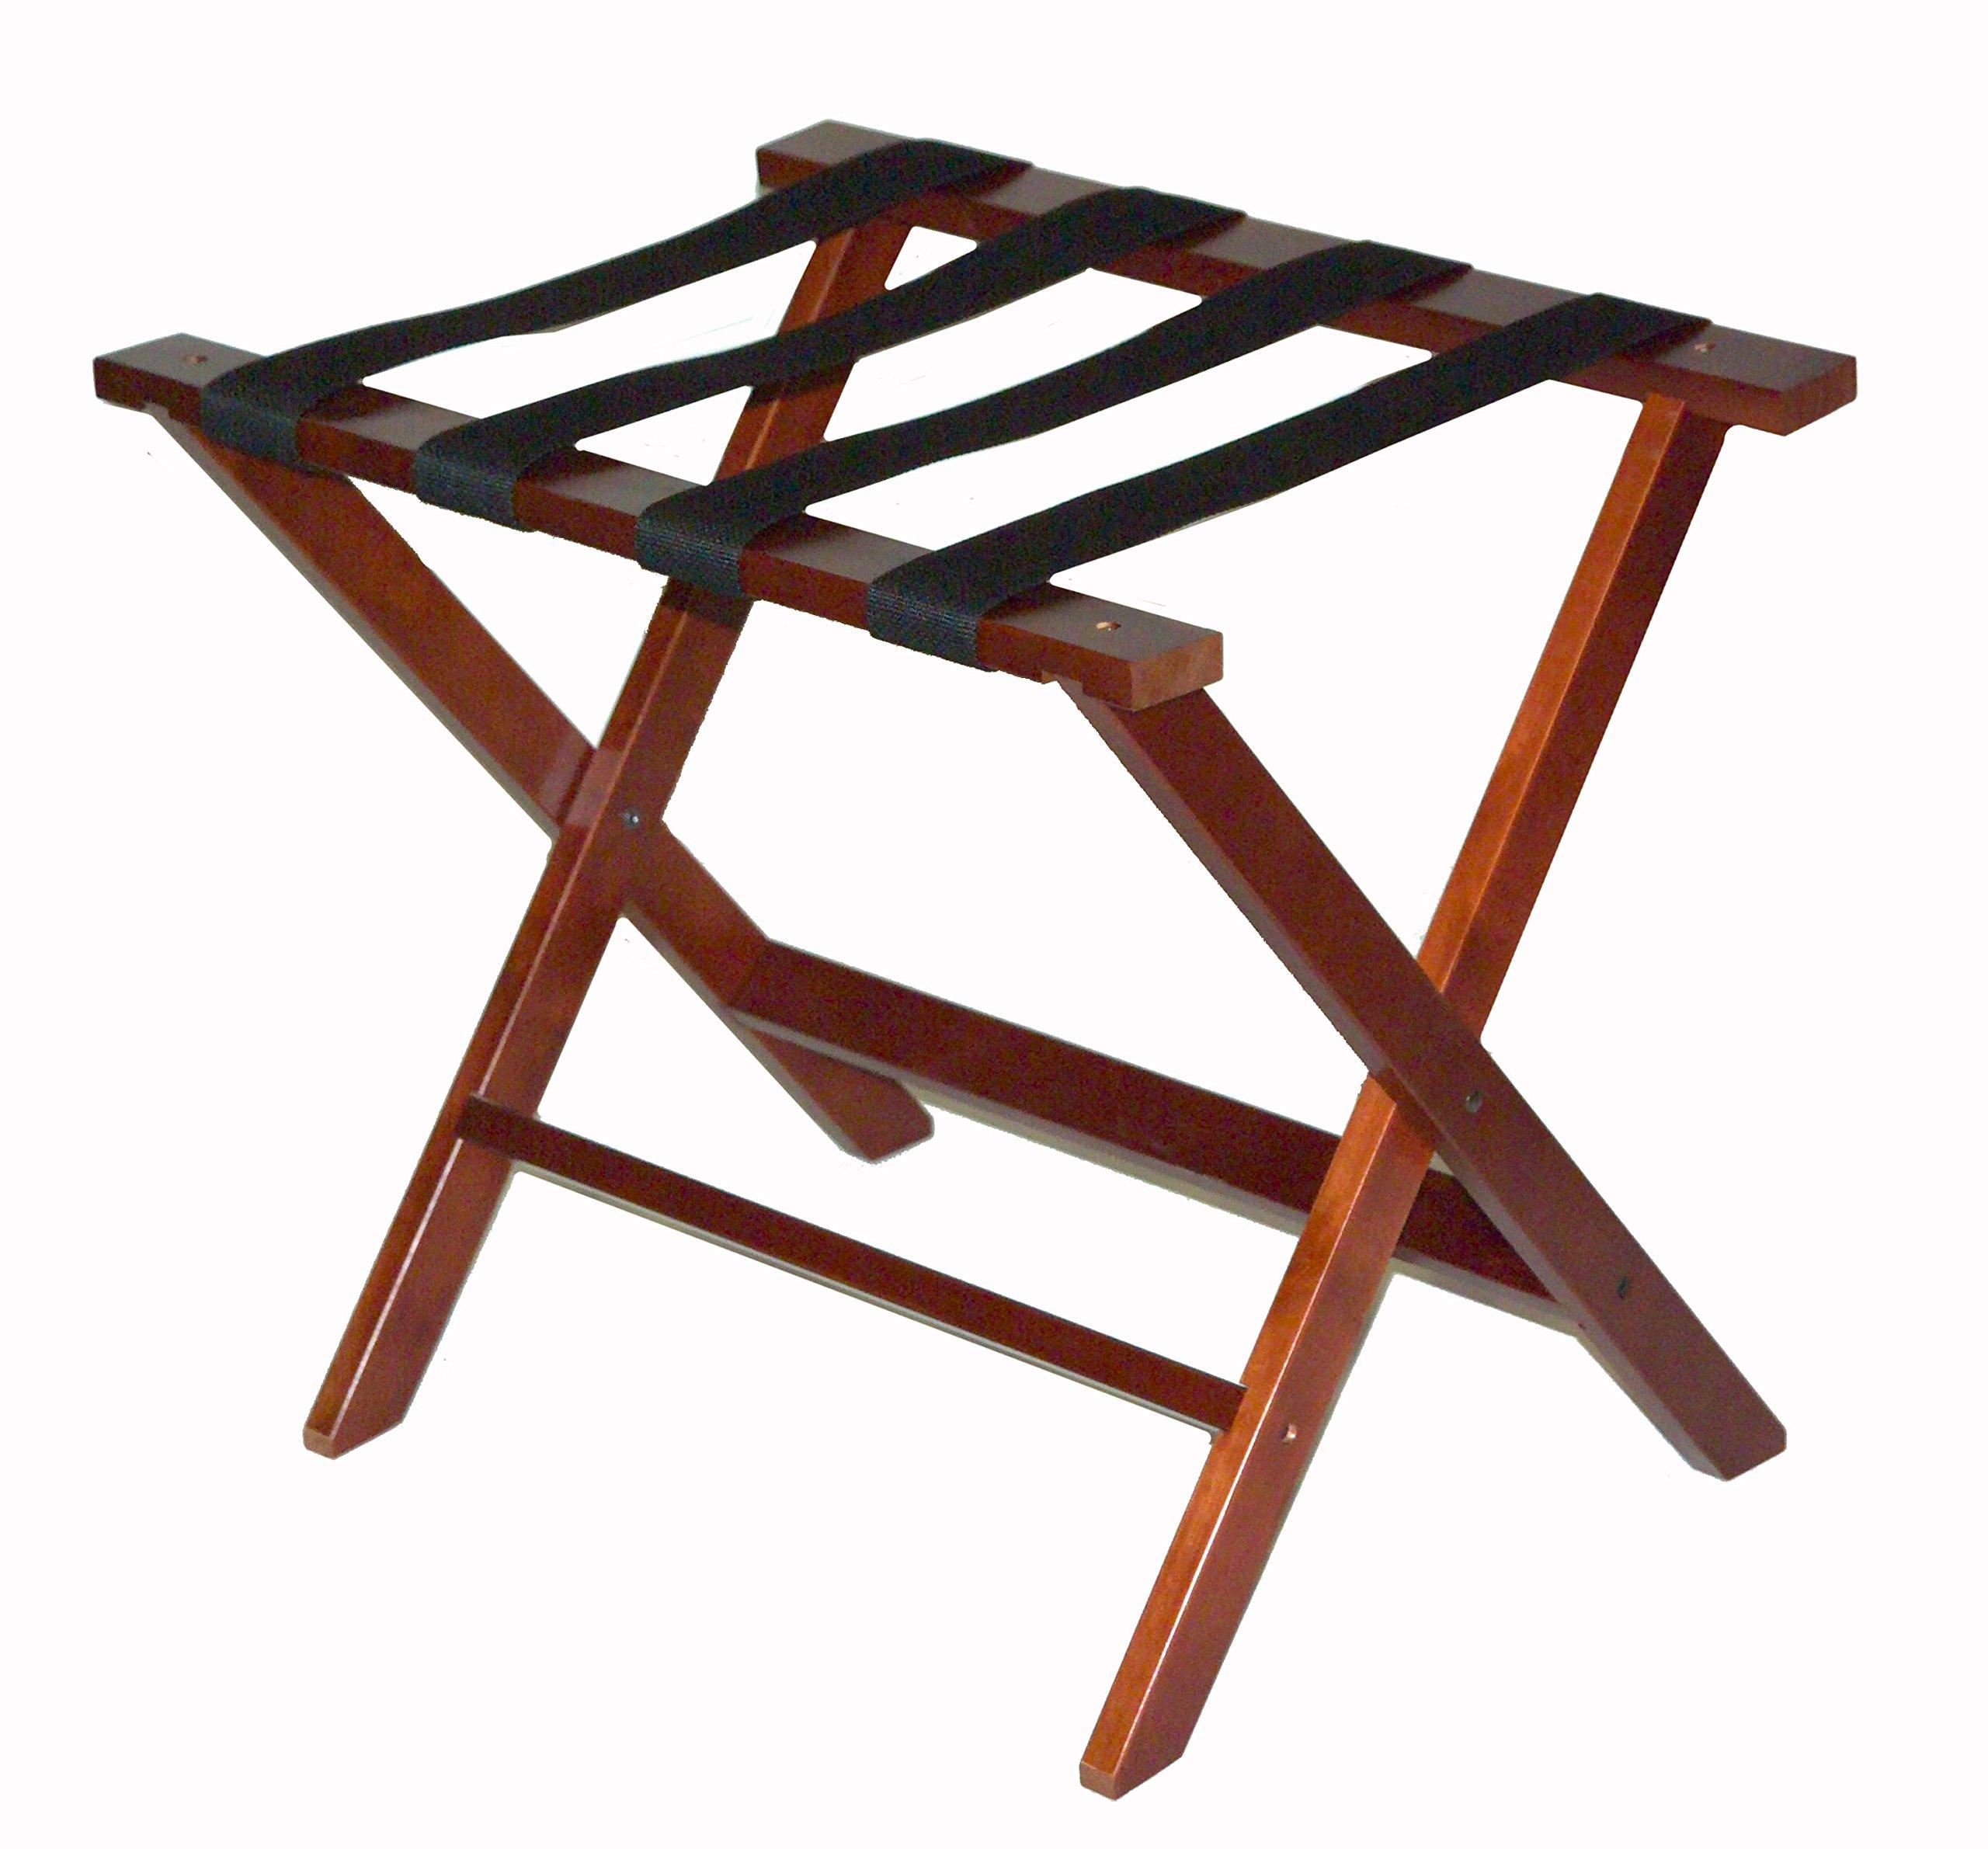 CSL 0LR-100CM-1 Wood Luggage Rack